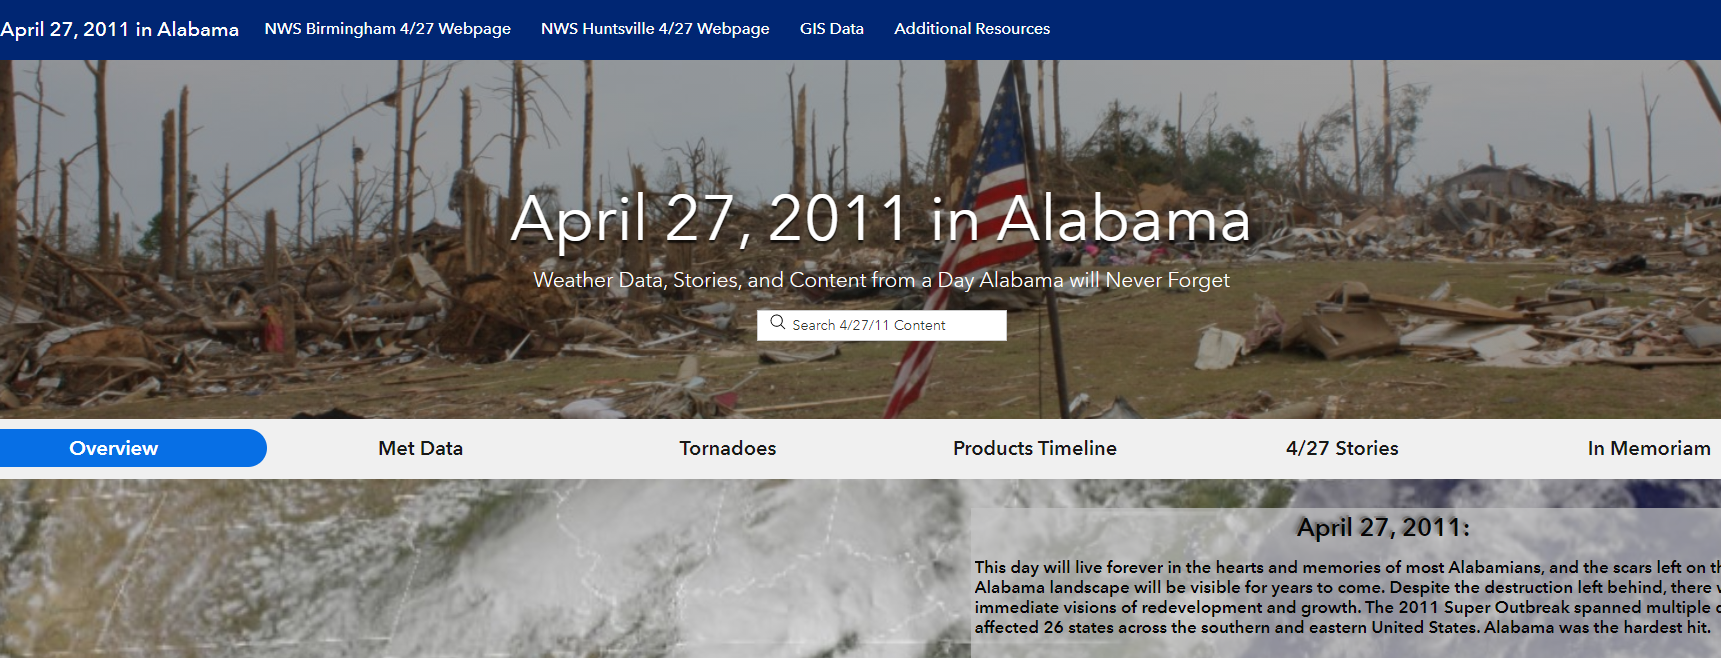 Website commemorates 2011 tornado outbreak that killed 240 people in Alabama